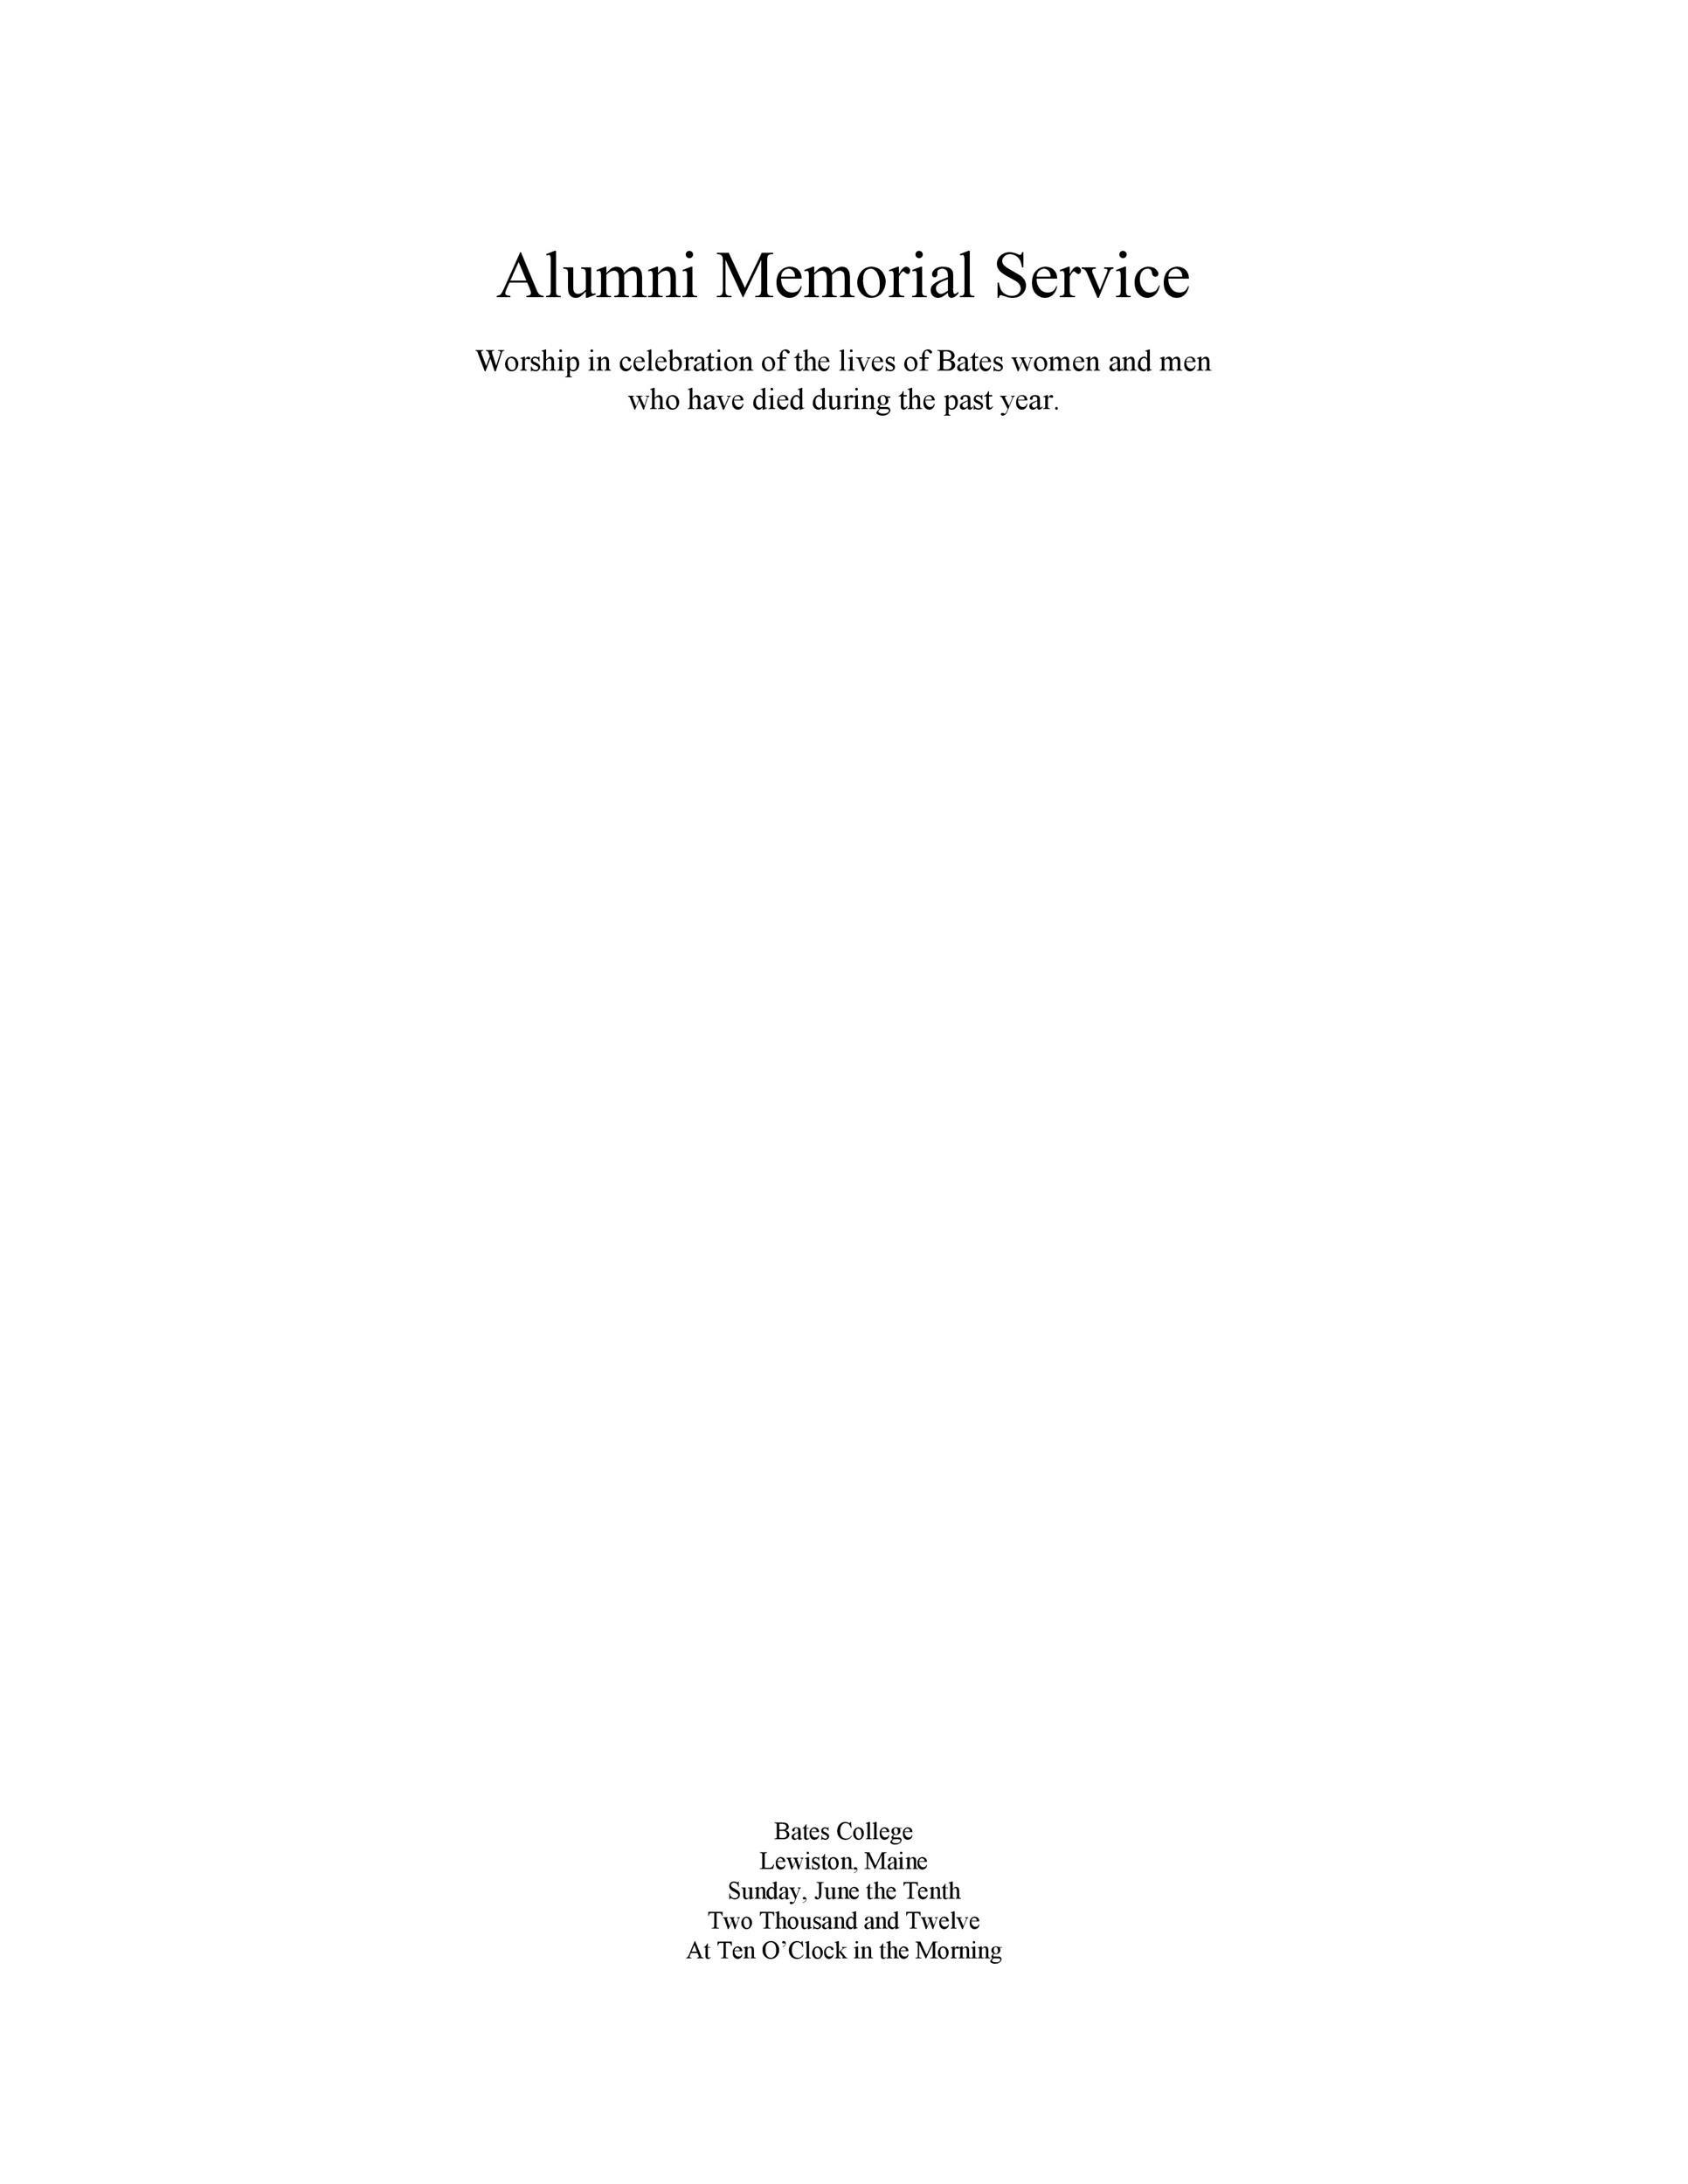 Free funeral program template 38